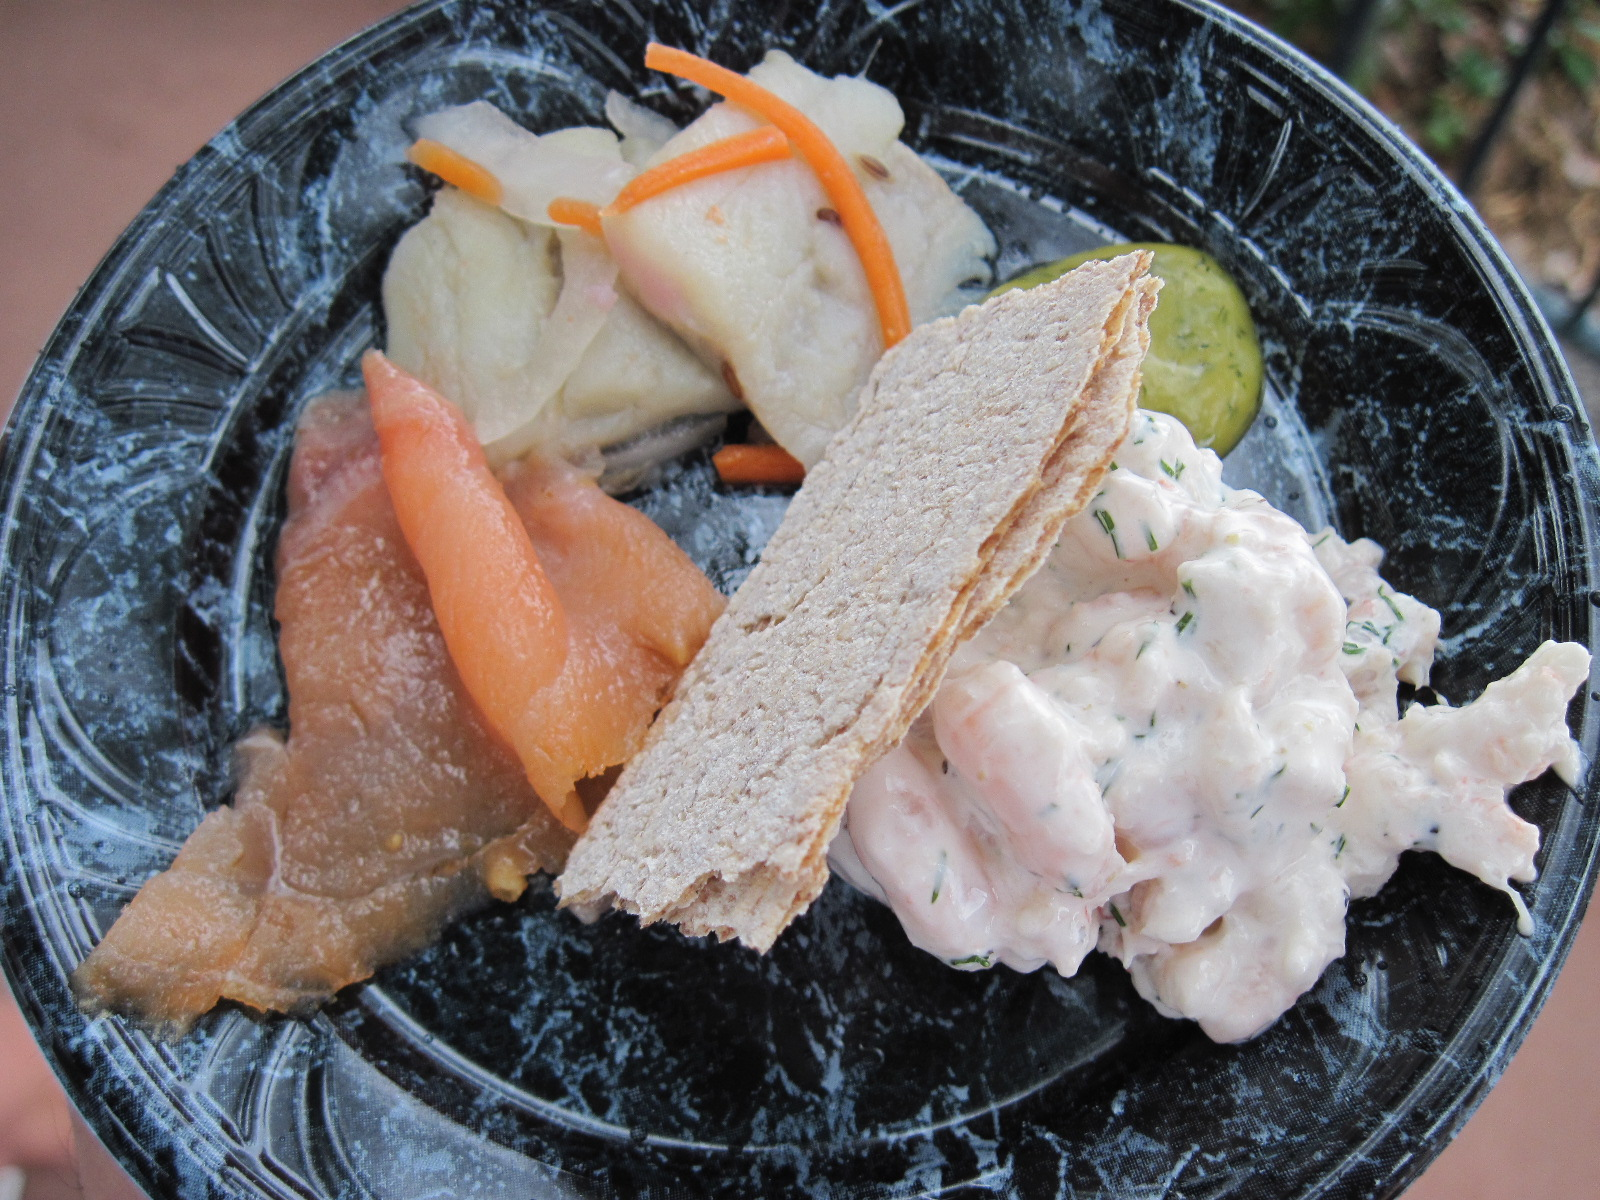 Taste of Scandinavia: Shrimp Salad, Cured Salmon, and Herring